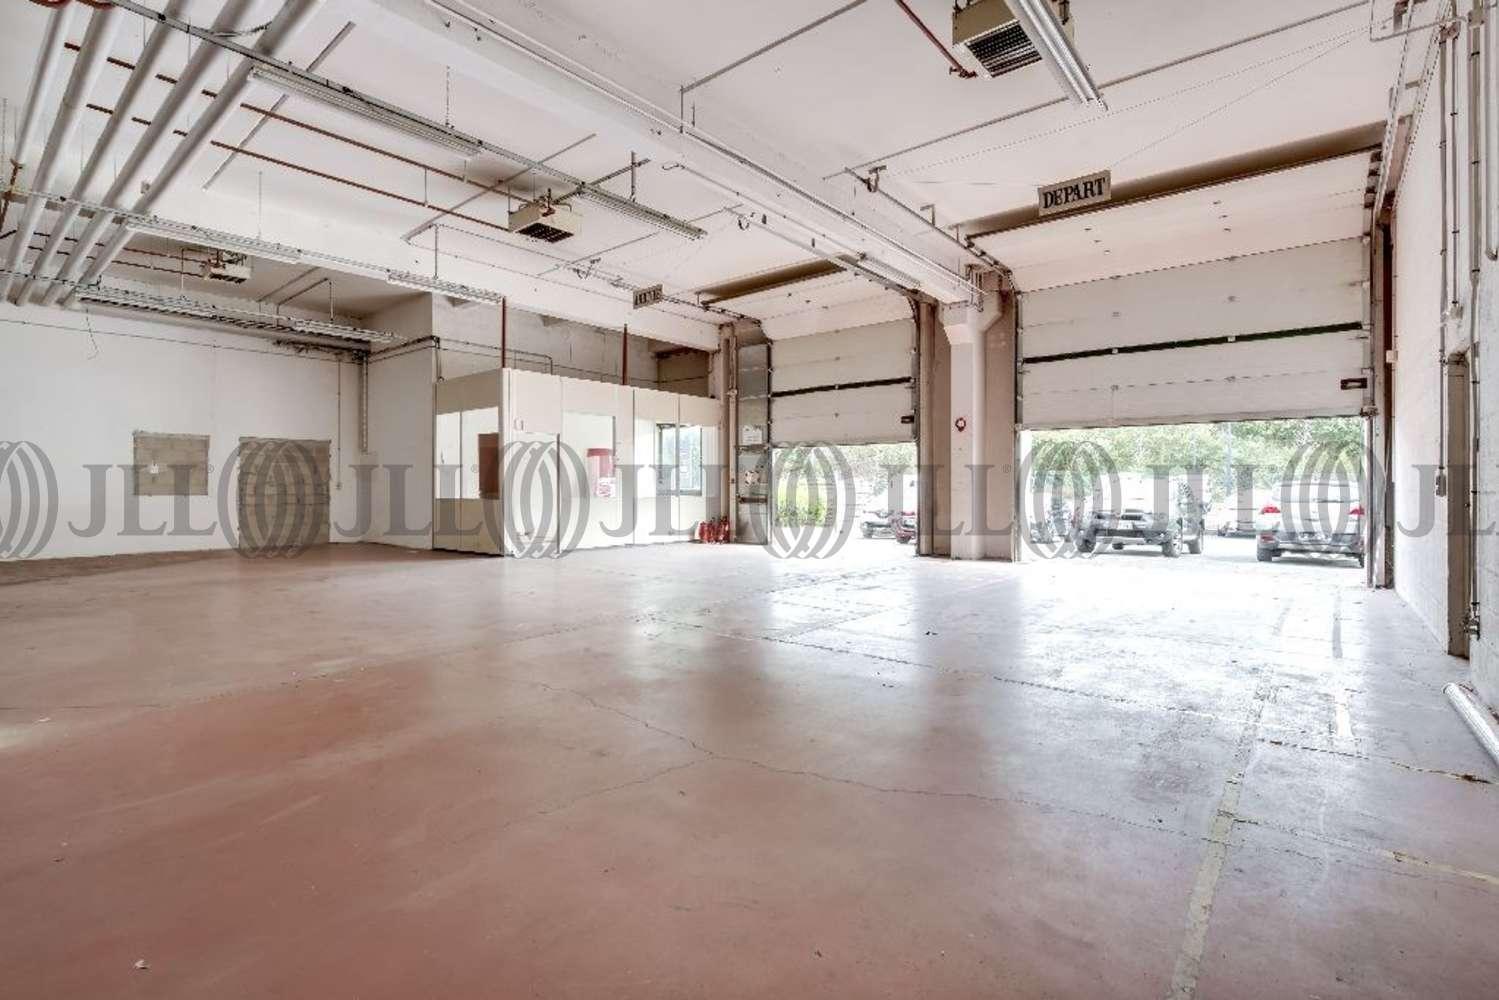 Activités/entrepôt Lisses, 91090 - EVEREST - 10581634